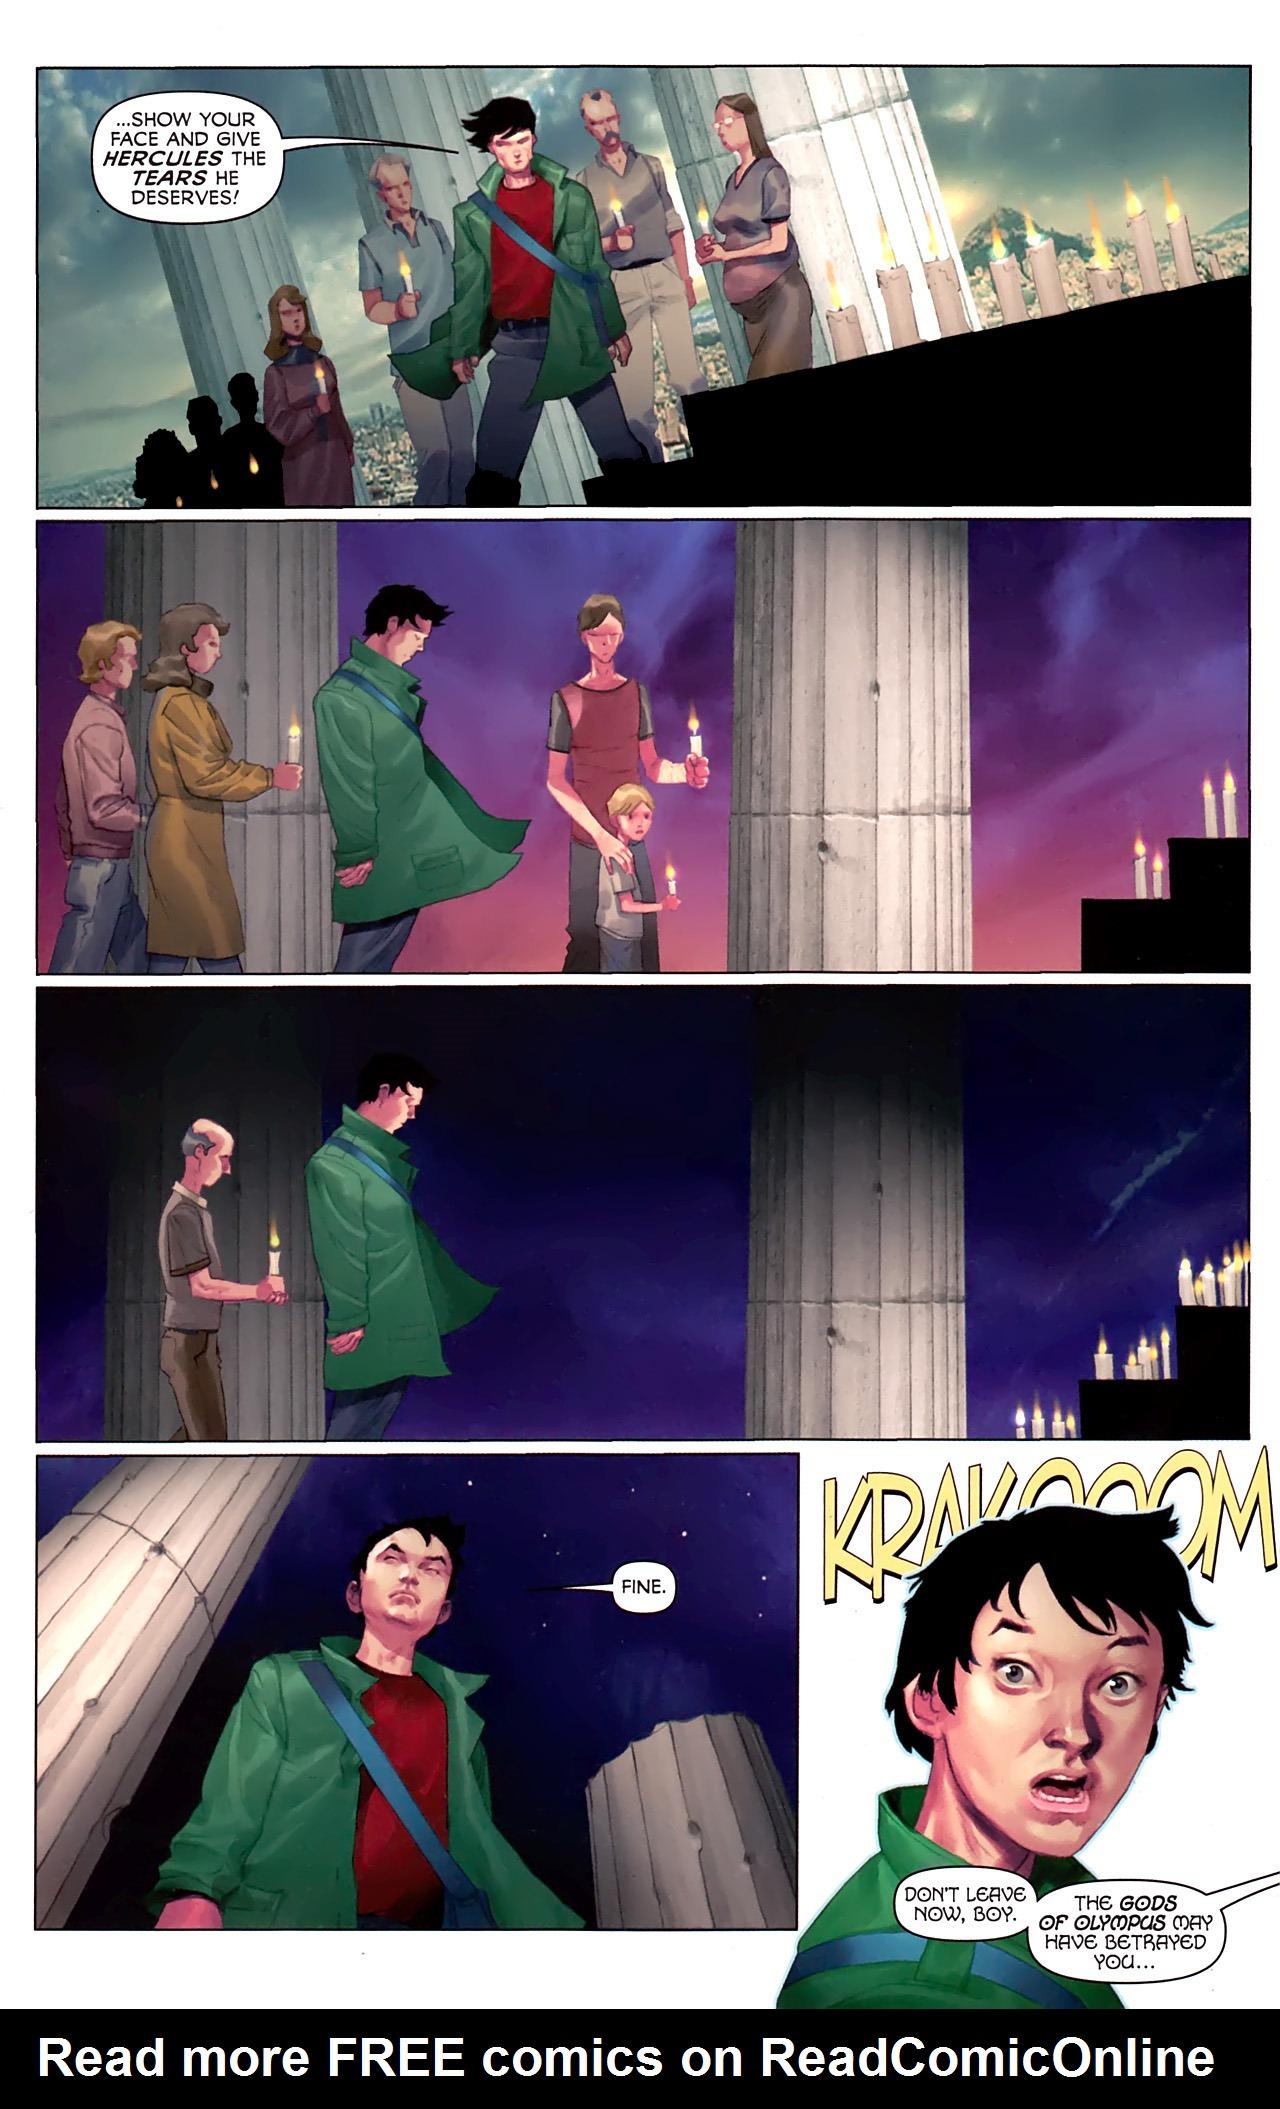 Read online Hercules: Fall of an Avenger comic -  Issue #1 - 5